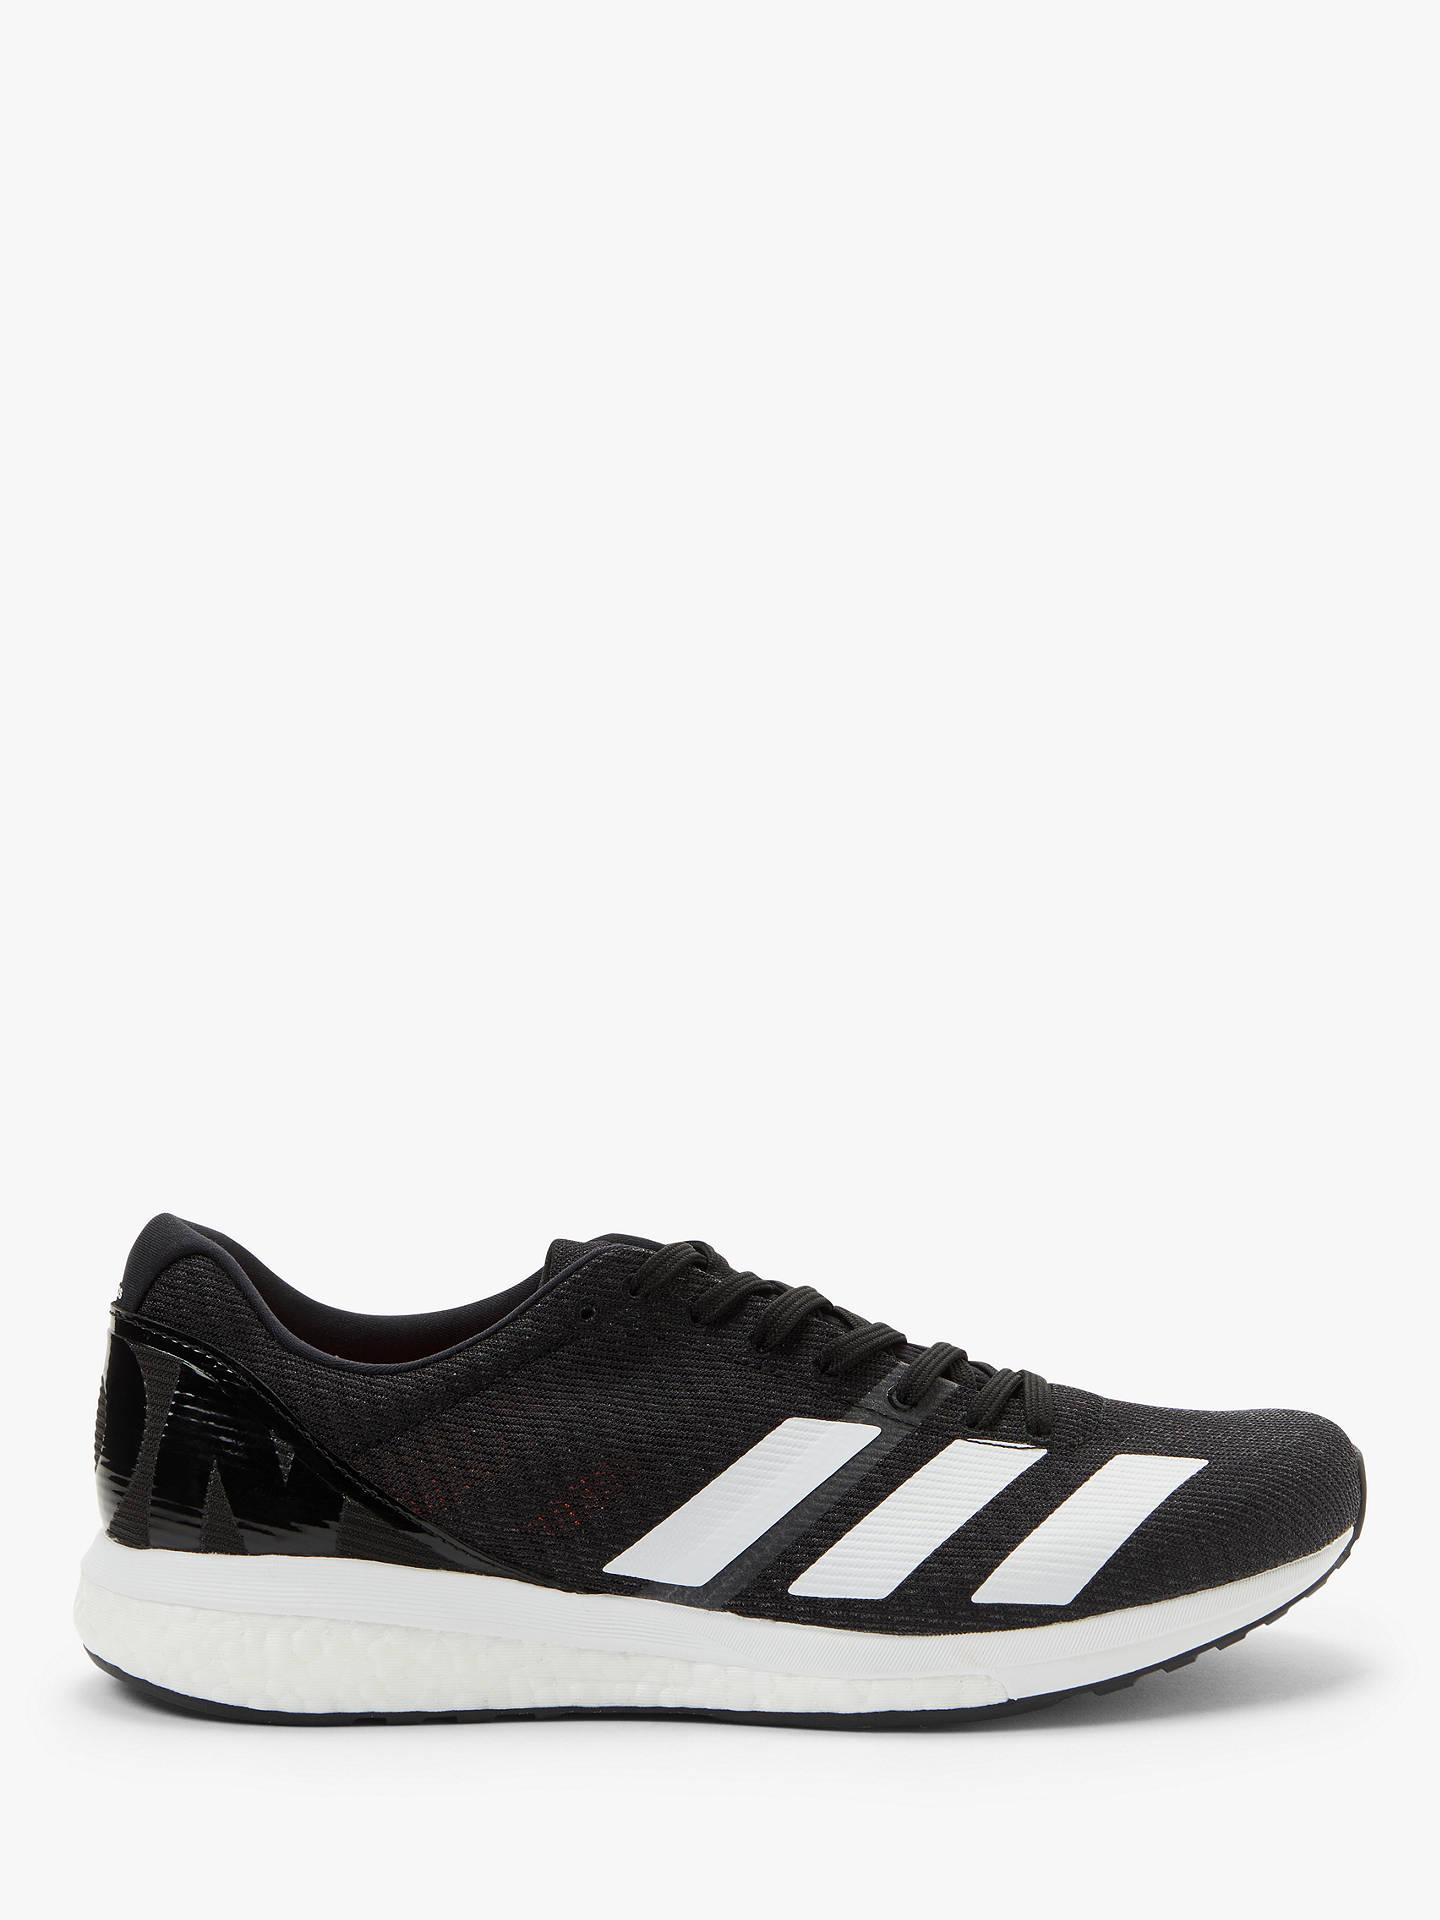 e0c8b13c951a Buy adidas Adizero Boston 8 Women's Running Shoes, Core Black/Cloud  White/Grey ...